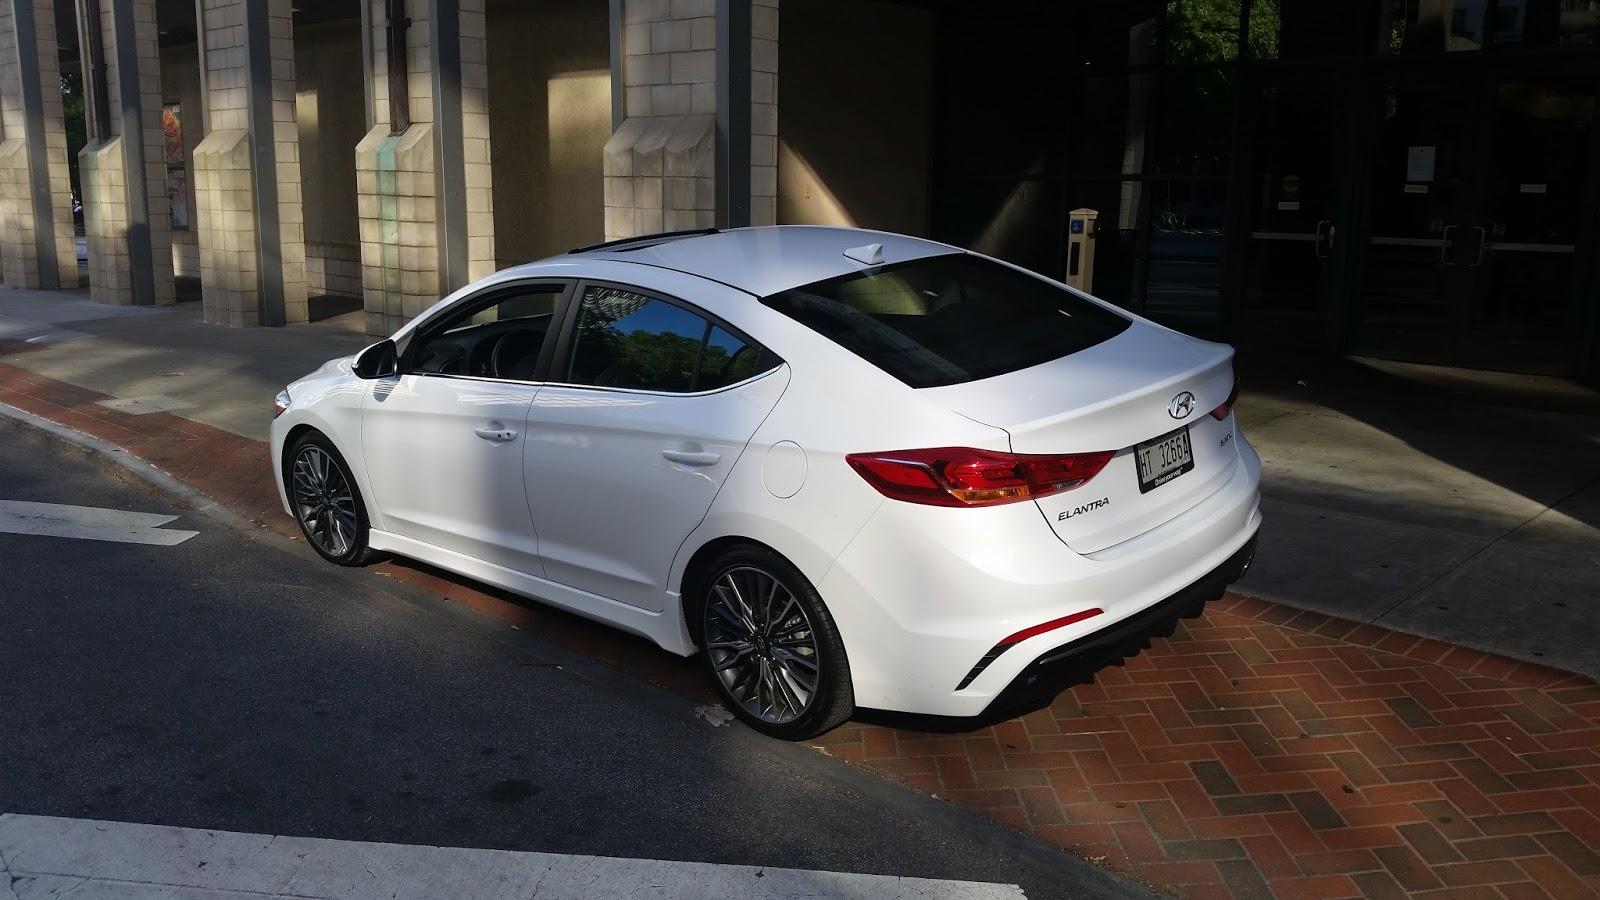 auto industry connection 2017 hyundai elantra turbo sport a compact sedan. Black Bedroom Furniture Sets. Home Design Ideas